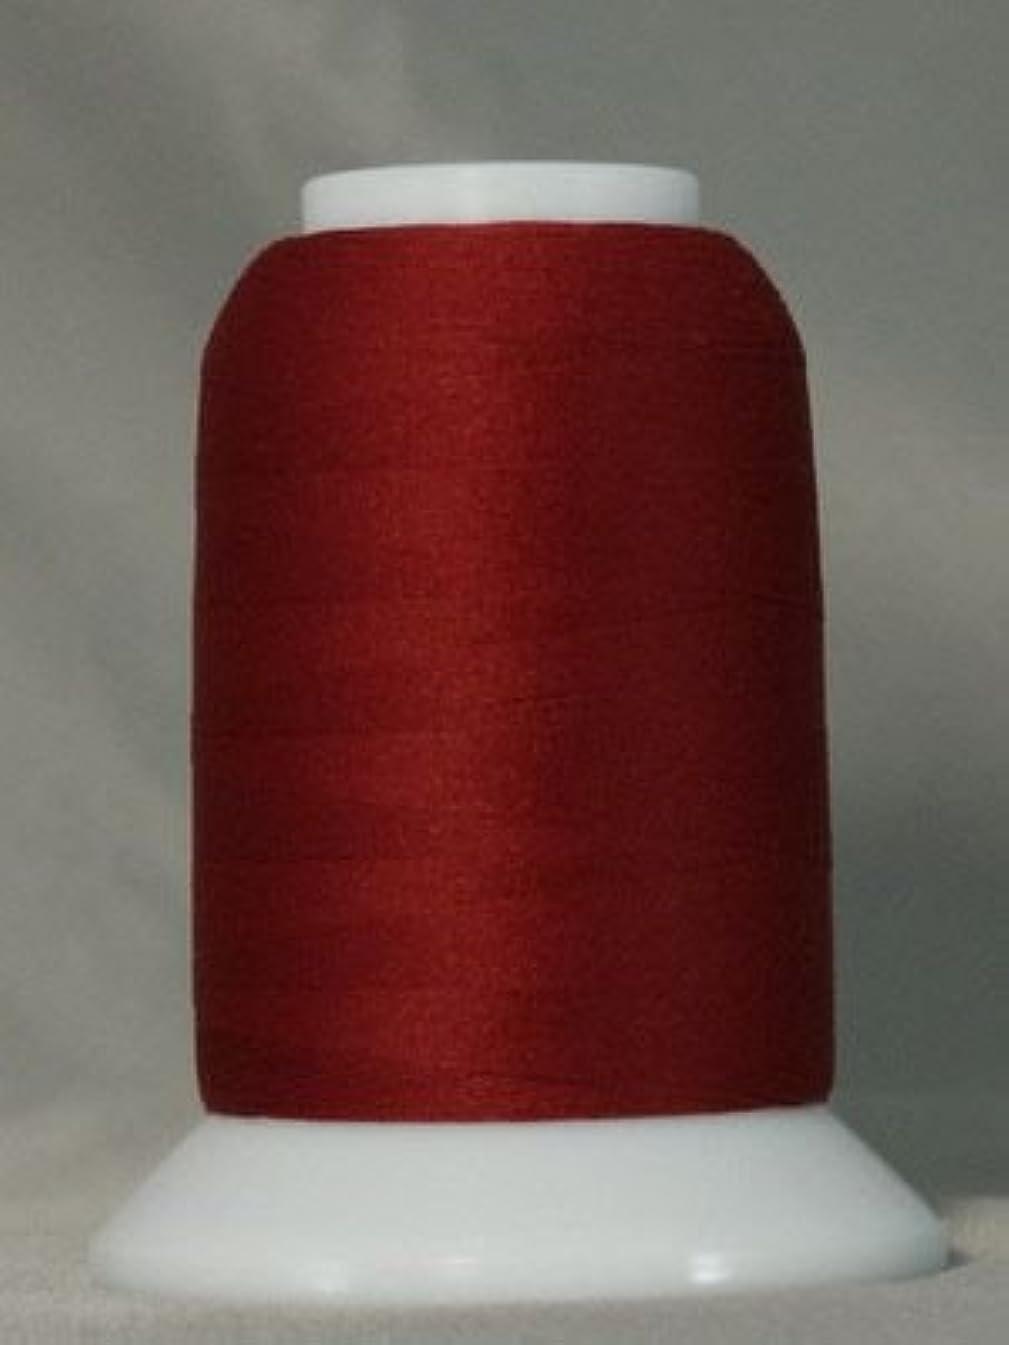 YLI Woolly Nylon Serger Thread 1000 Meters (Chestnut Red)